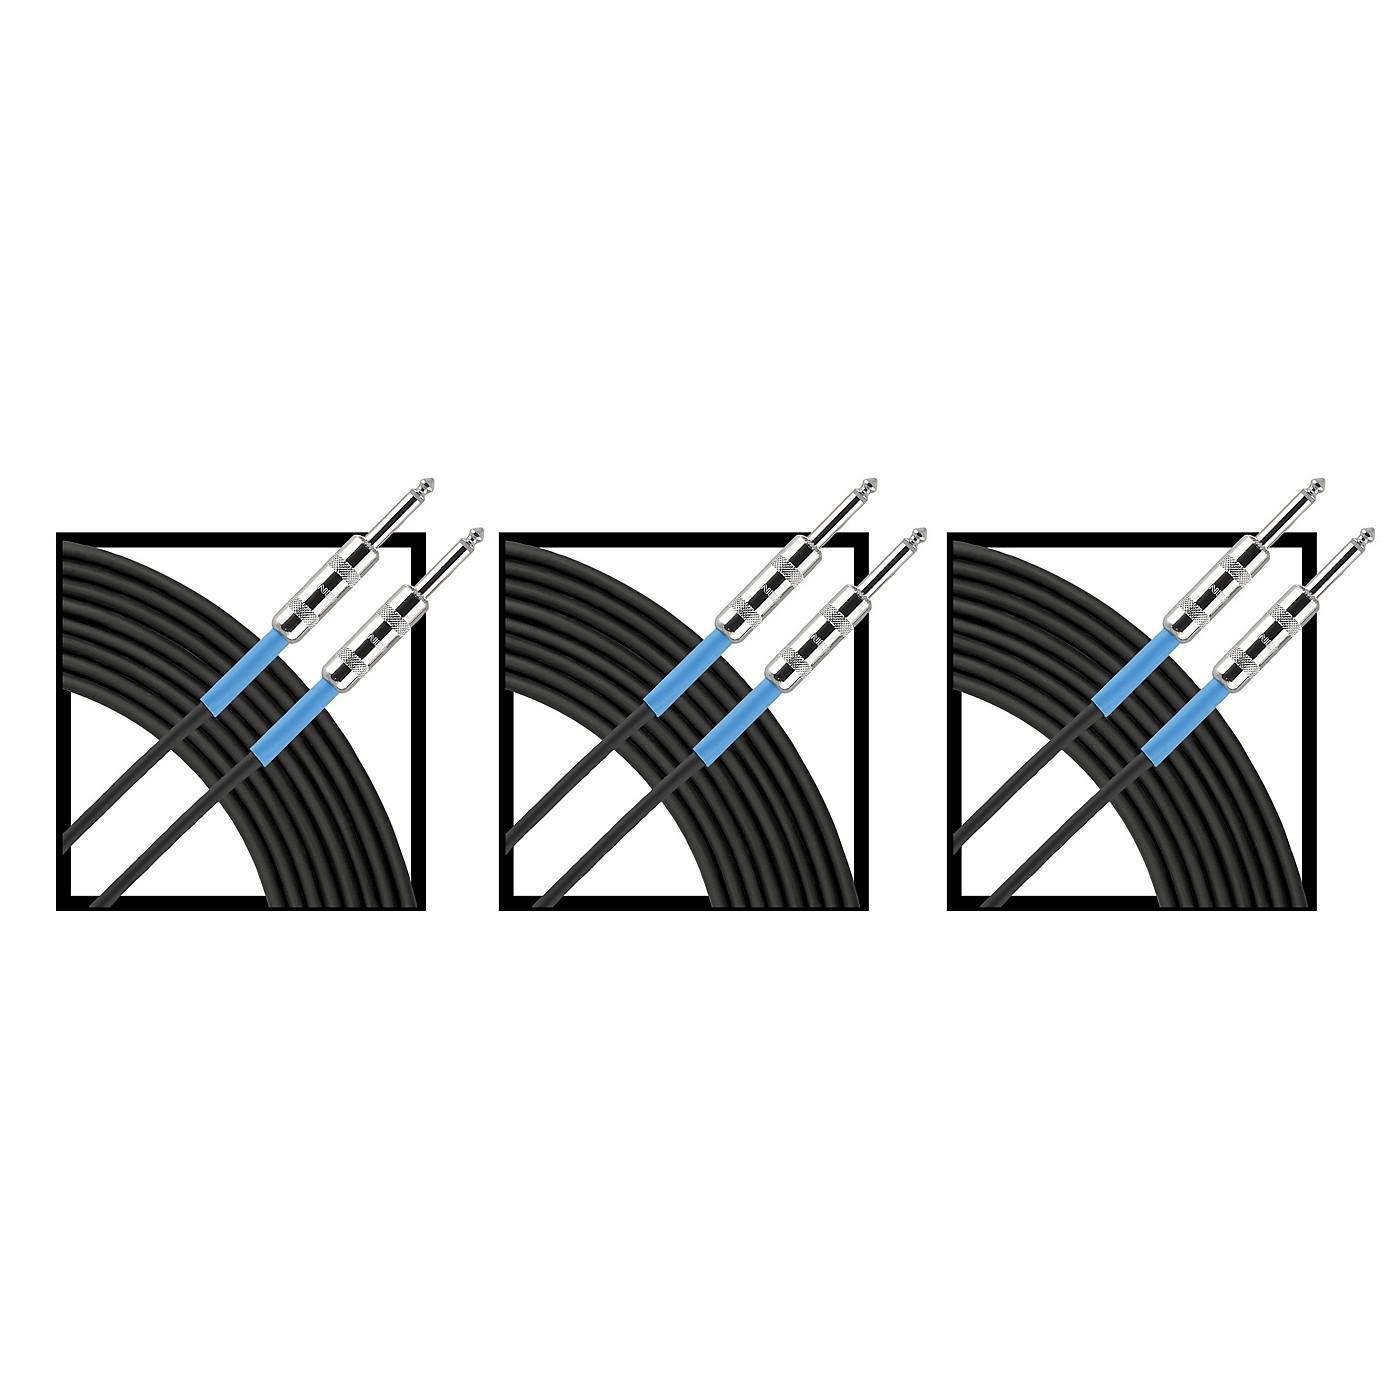 Livewire Advantage Instrument Cable Regular 10 ft. Black 3-Pack thumbnail